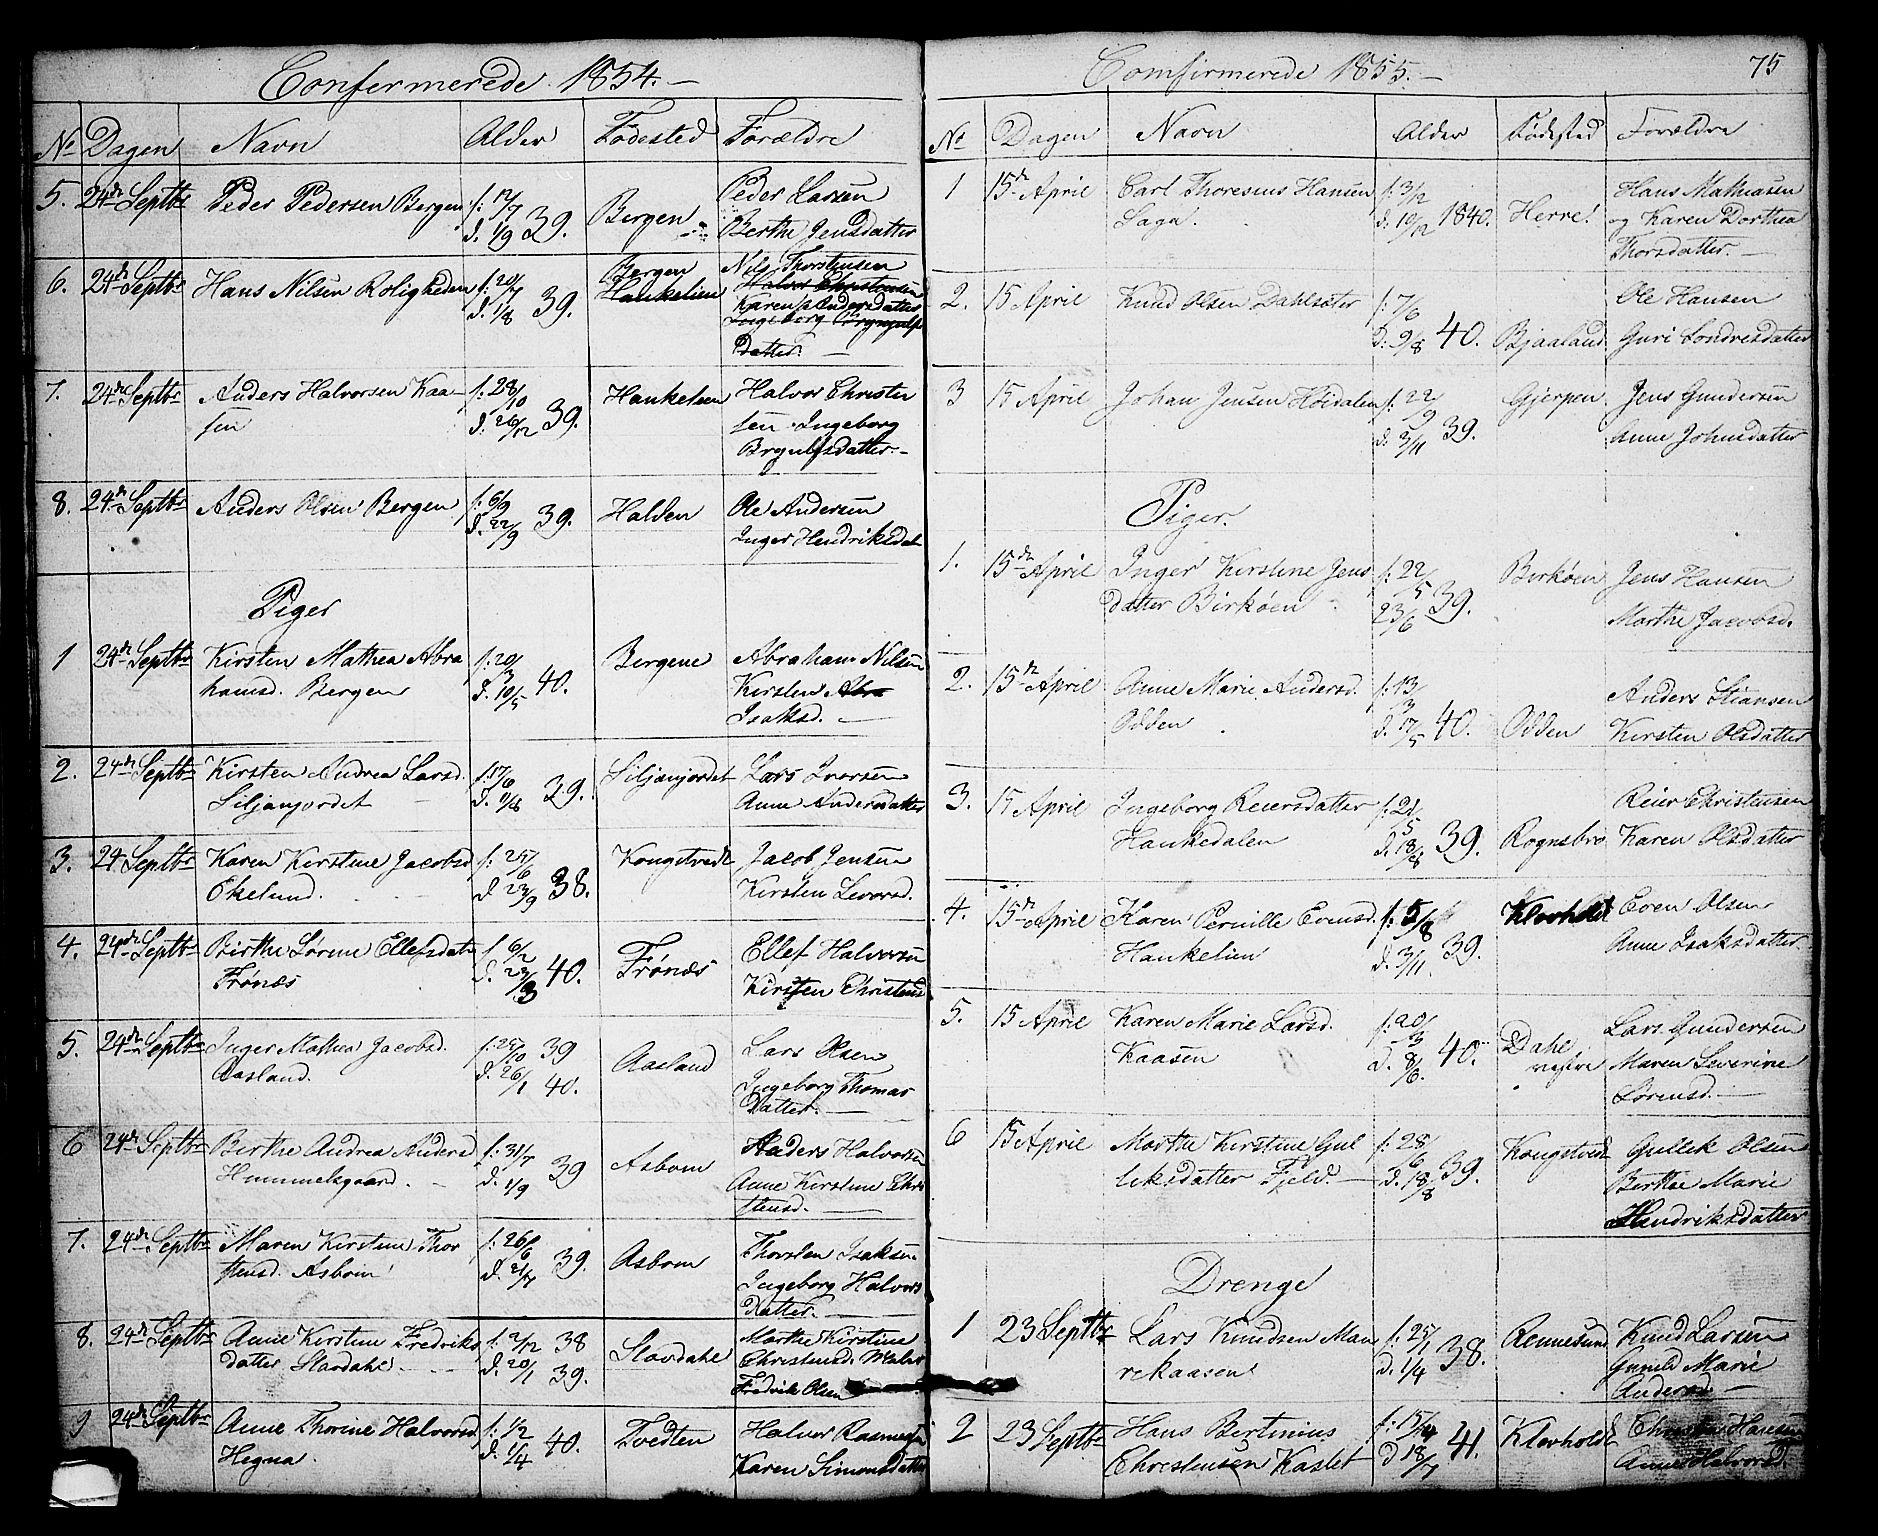 SAKO, Solum kirkebøker, G/Gb/L0001: Klokkerbok nr. II 1, 1848-1859, s. 75